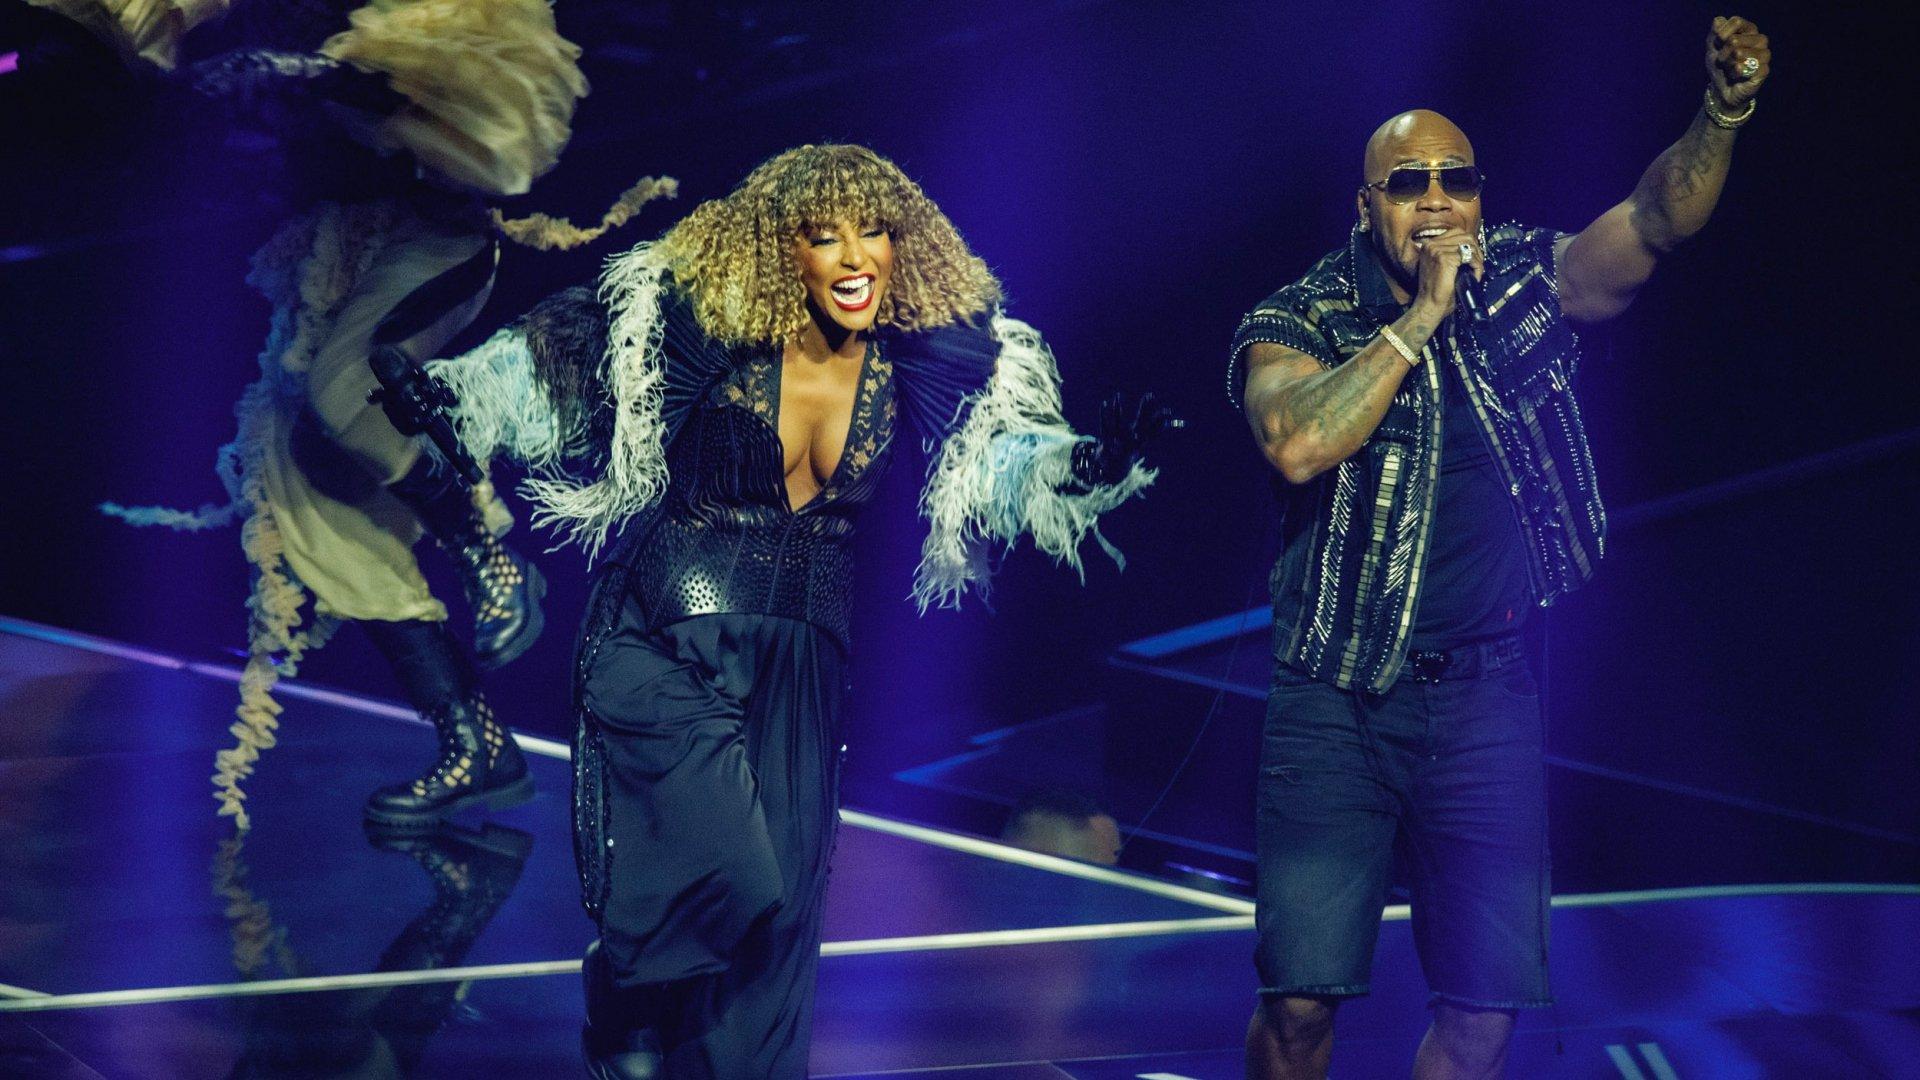 eurovision problema palco senhit